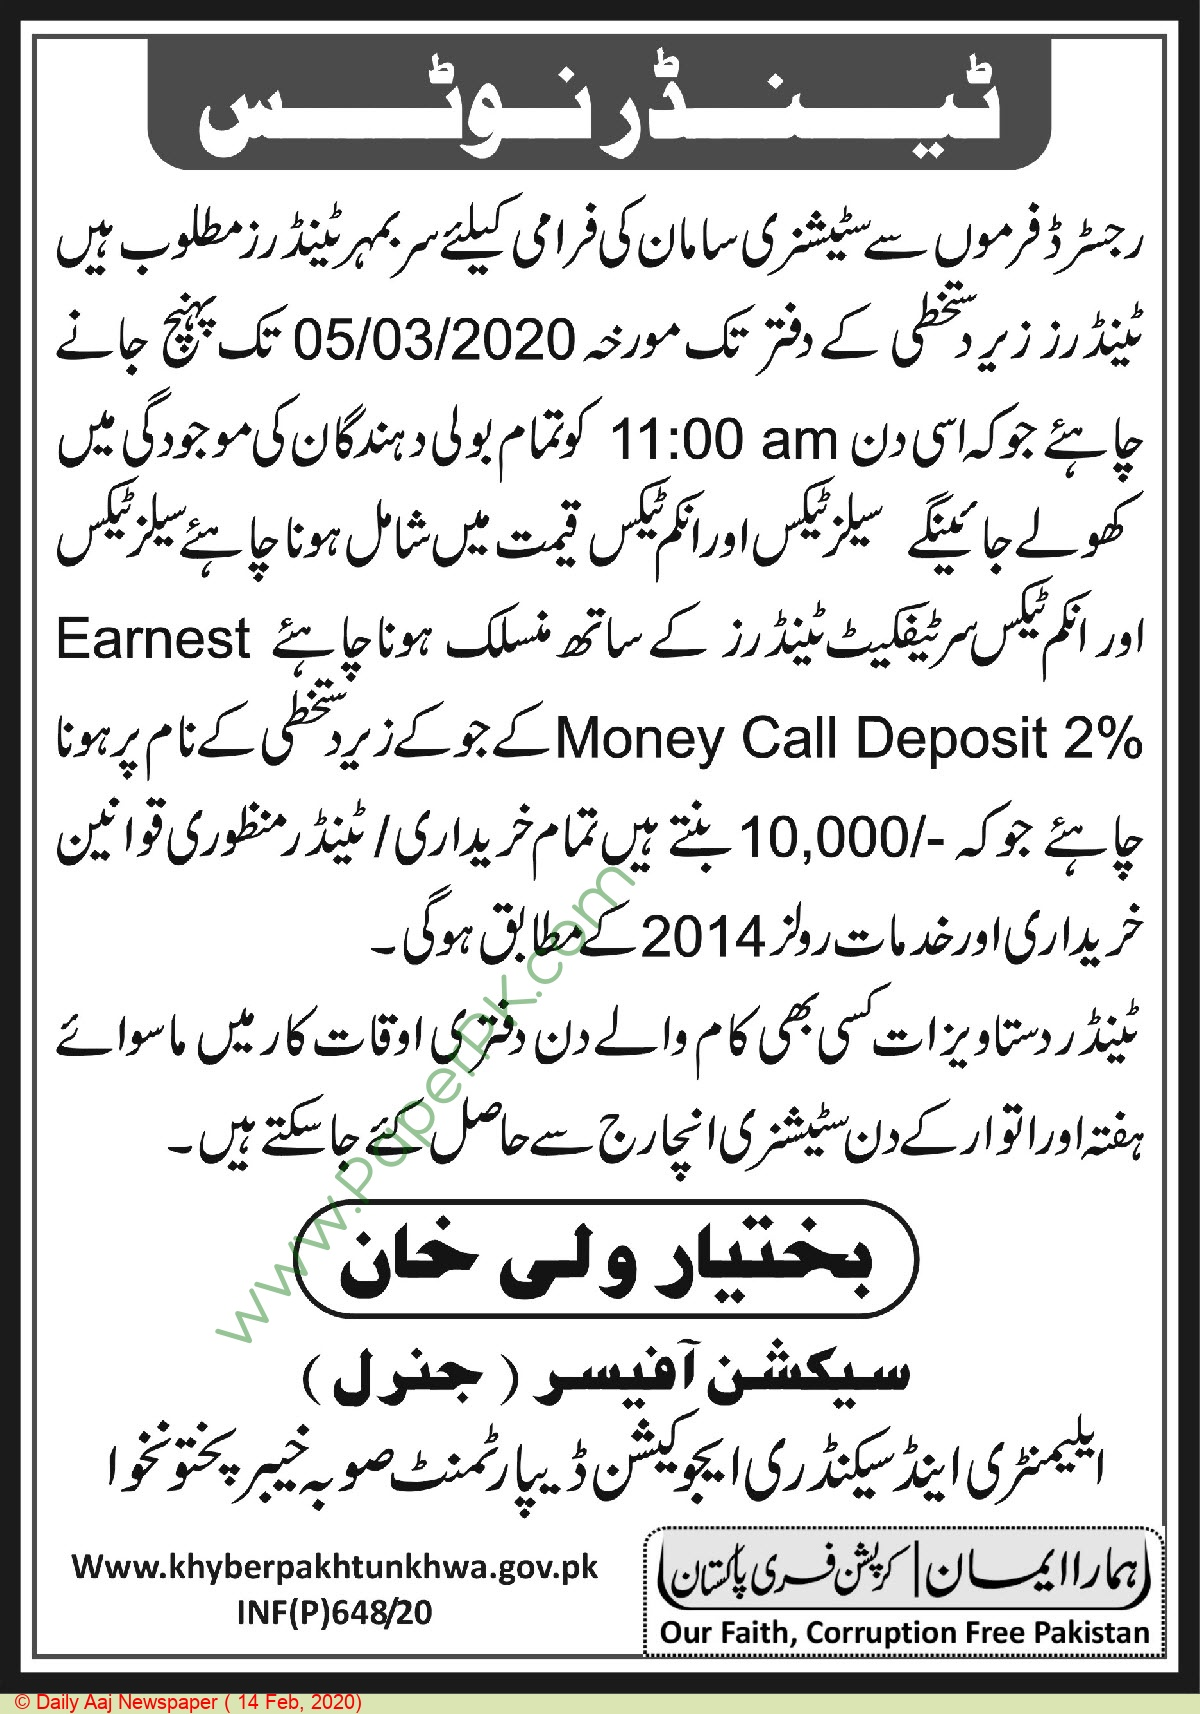 Elementary & Secondary Education Department Peshawar Tender Notice